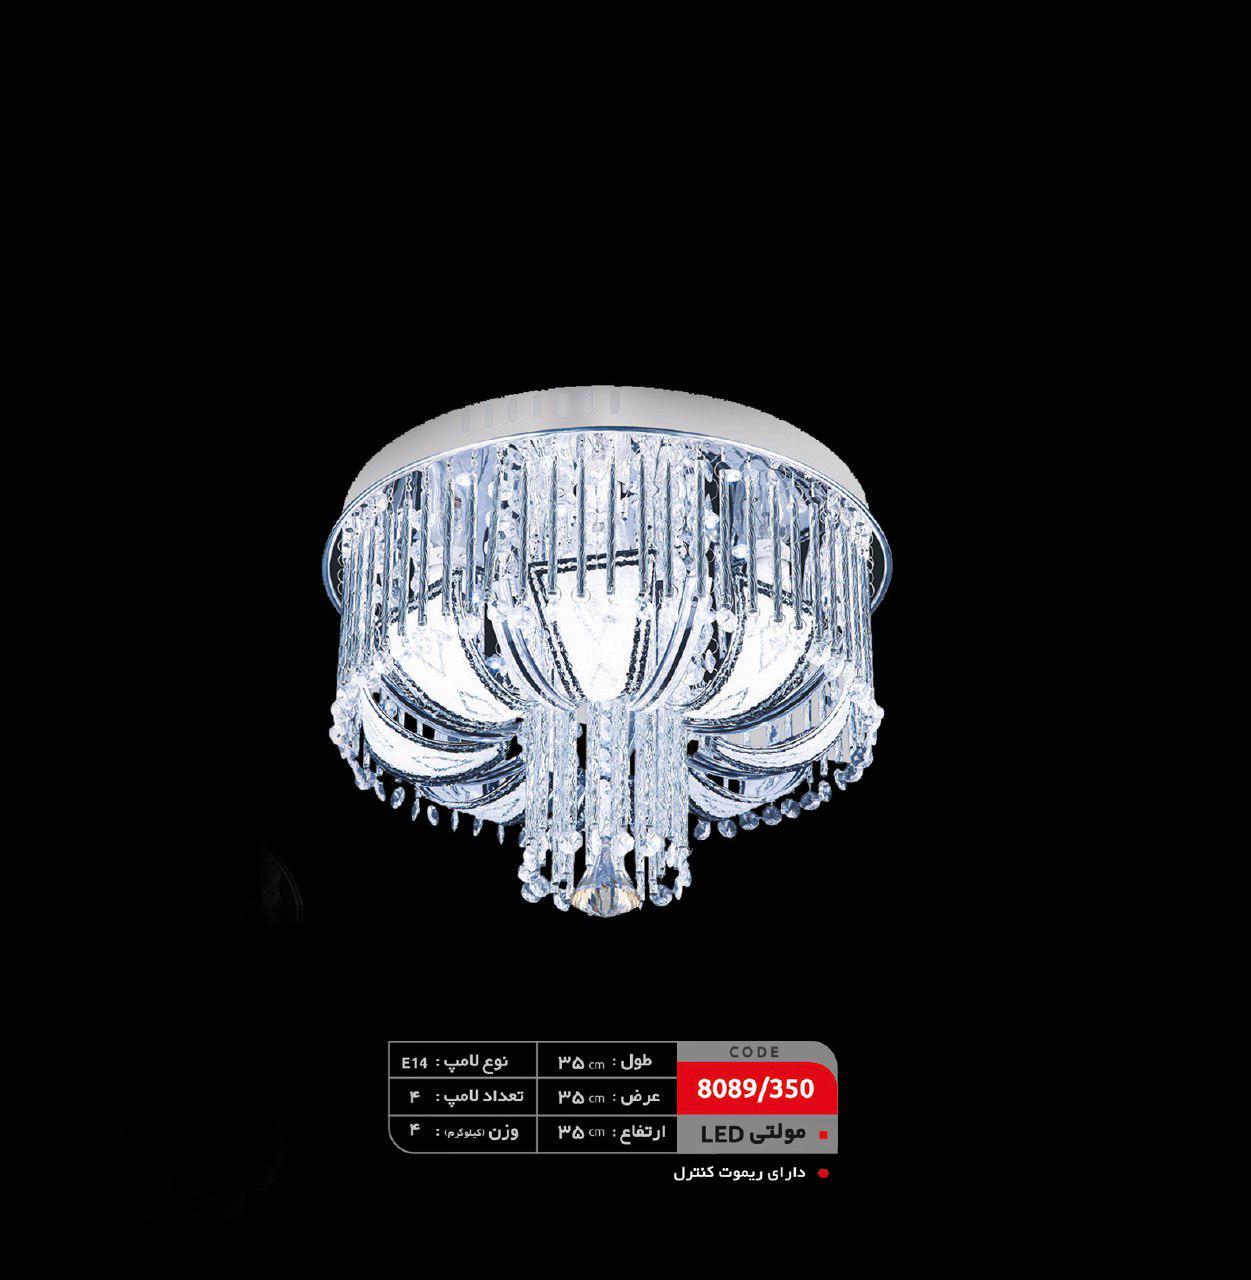 لوستر سقفی مولتی LED(کد: ۳۵۰/ ۸۰۸۹)  